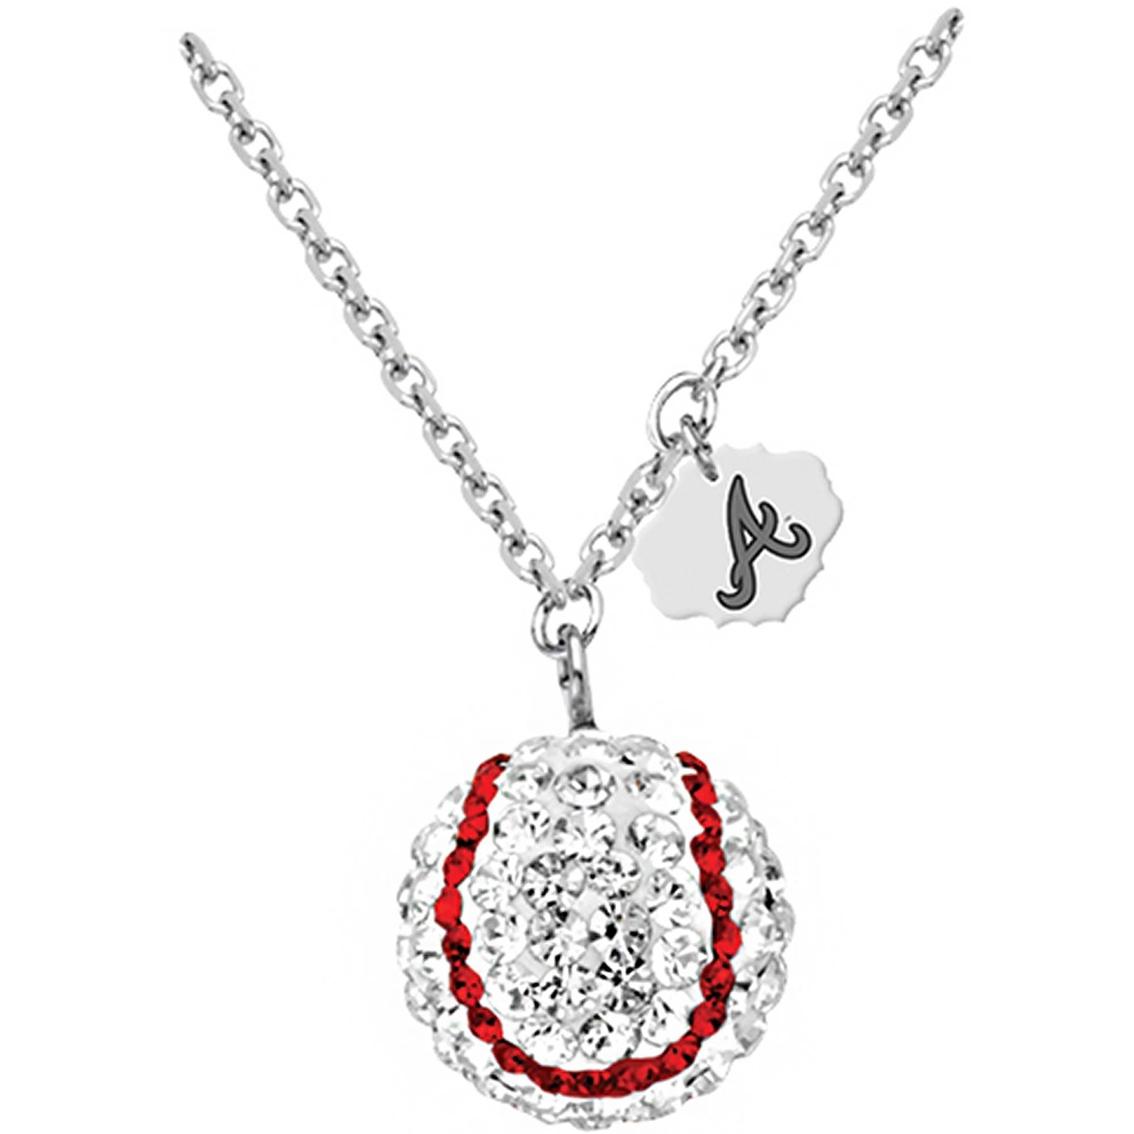 359f515b612 Sterling Silver MLB Atlanta Braves Baseball Necklace with Austrian Crystals